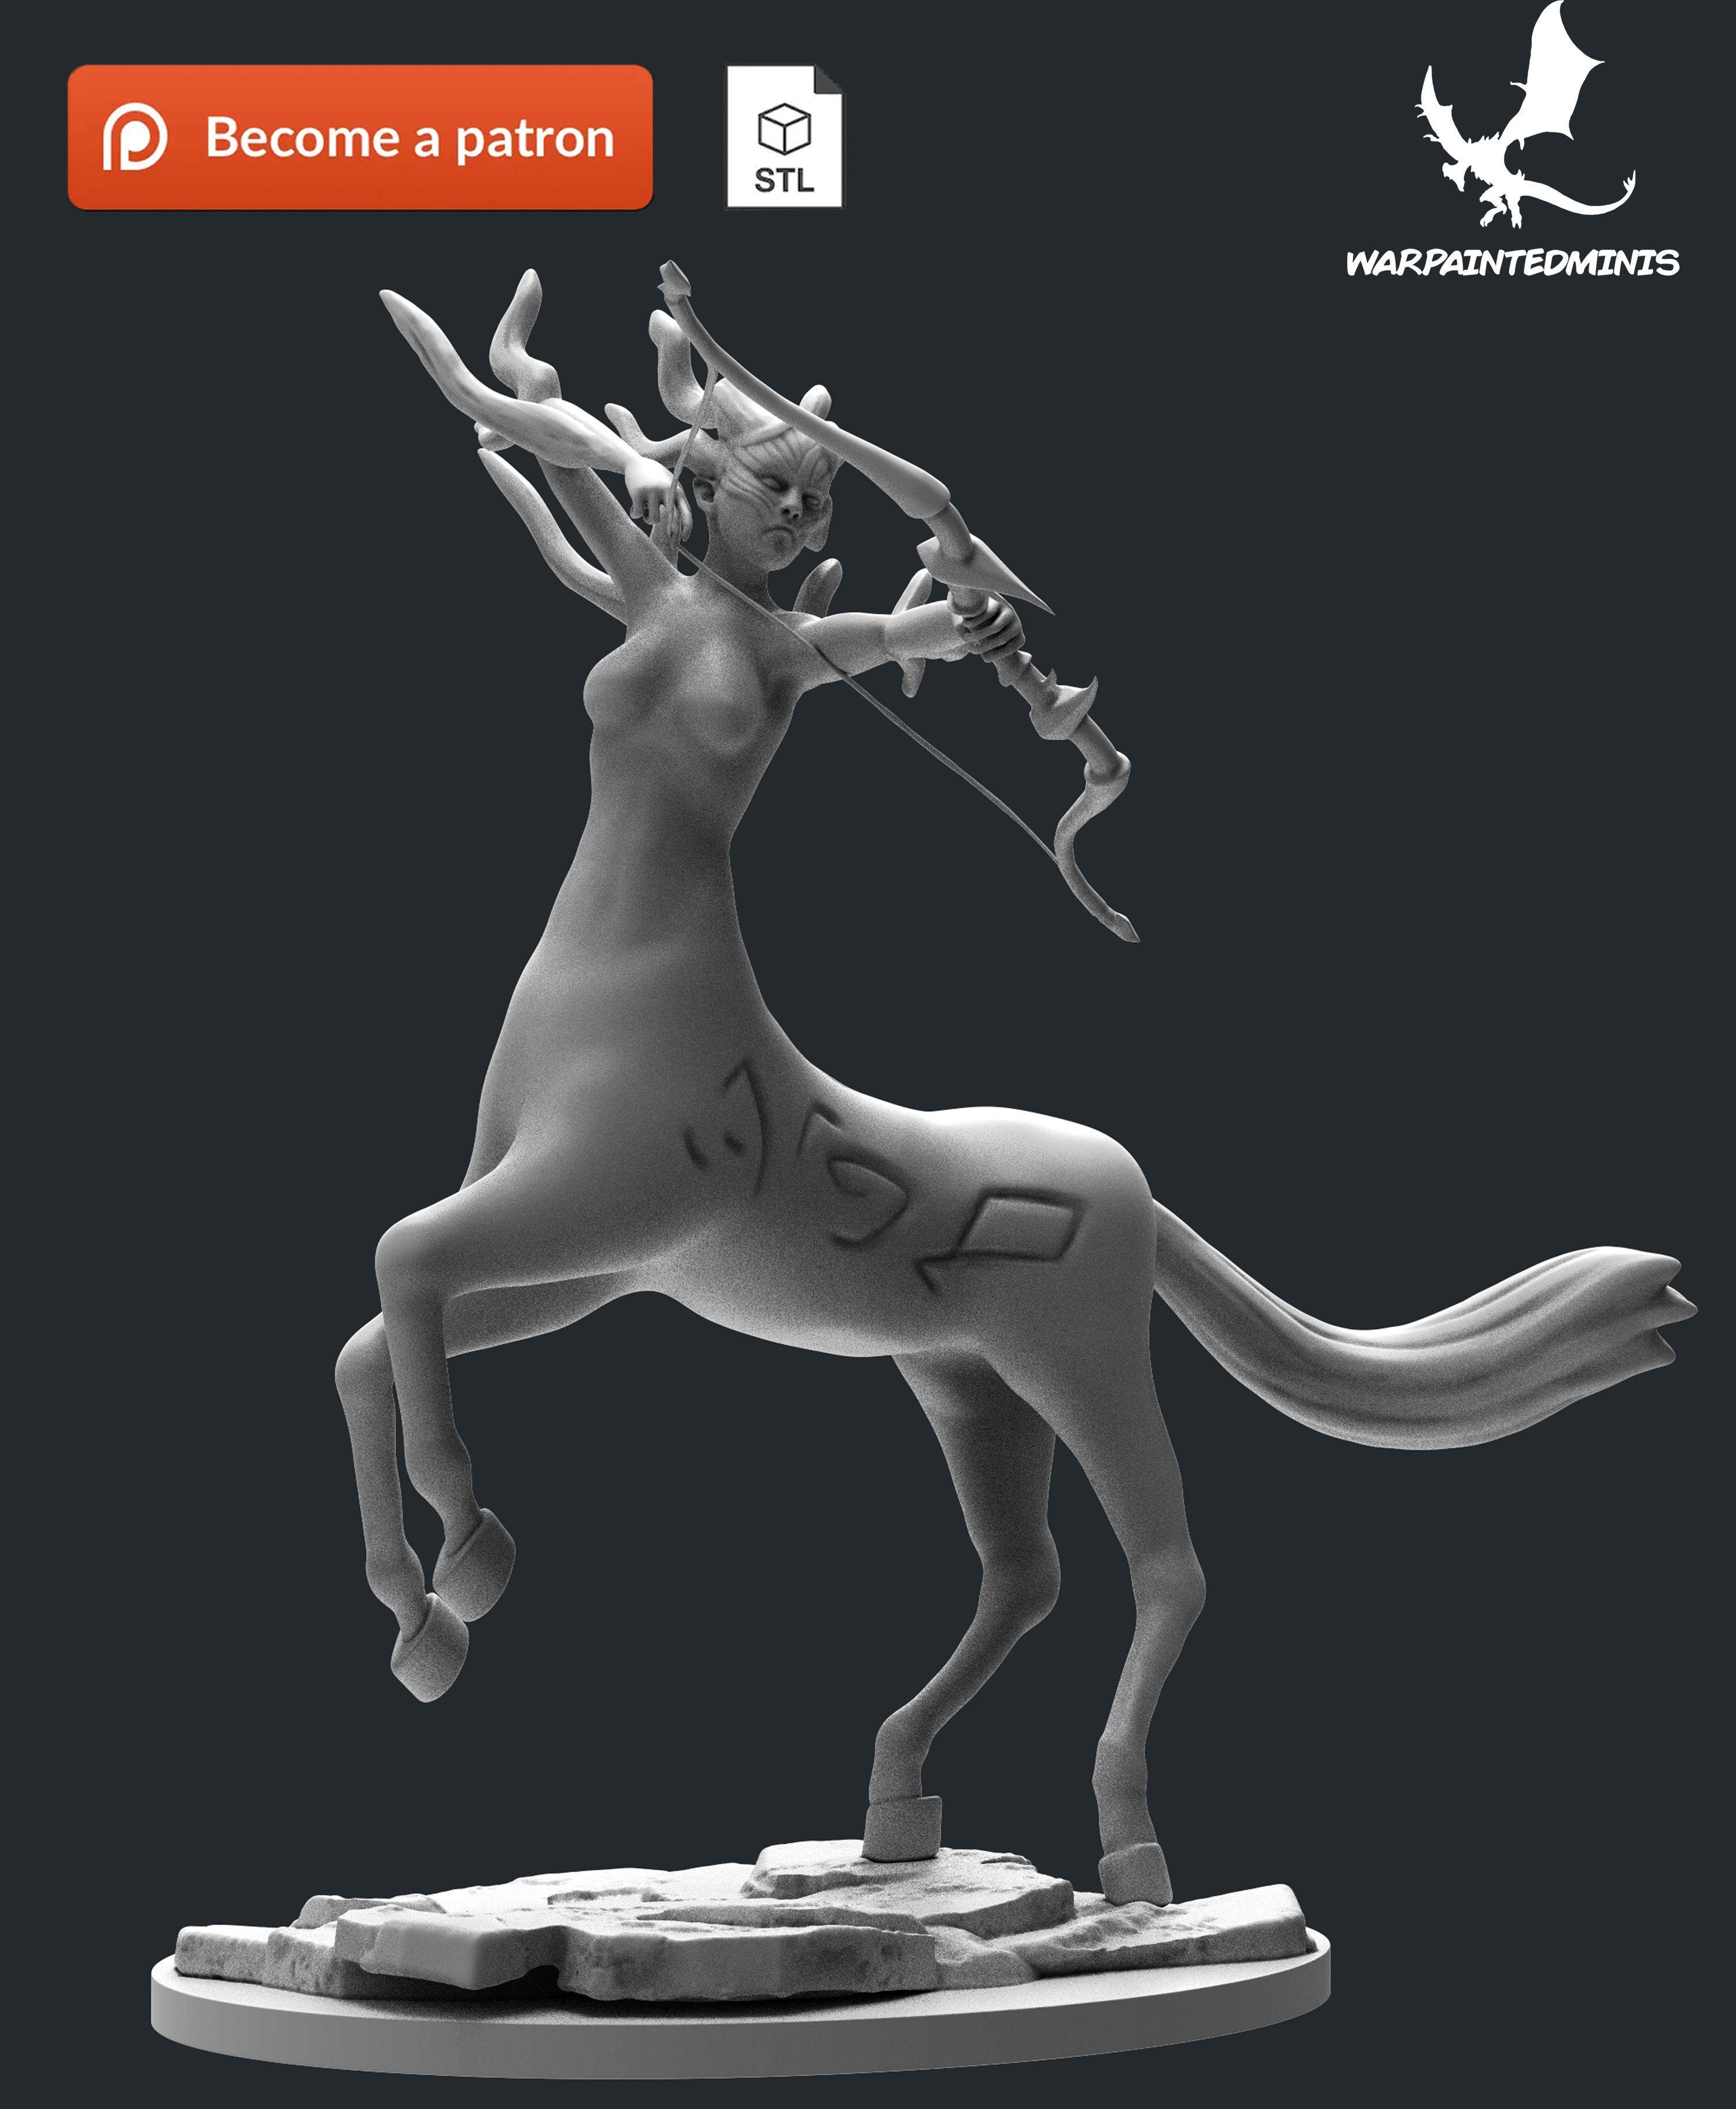 Centaur 3D Print Model STL